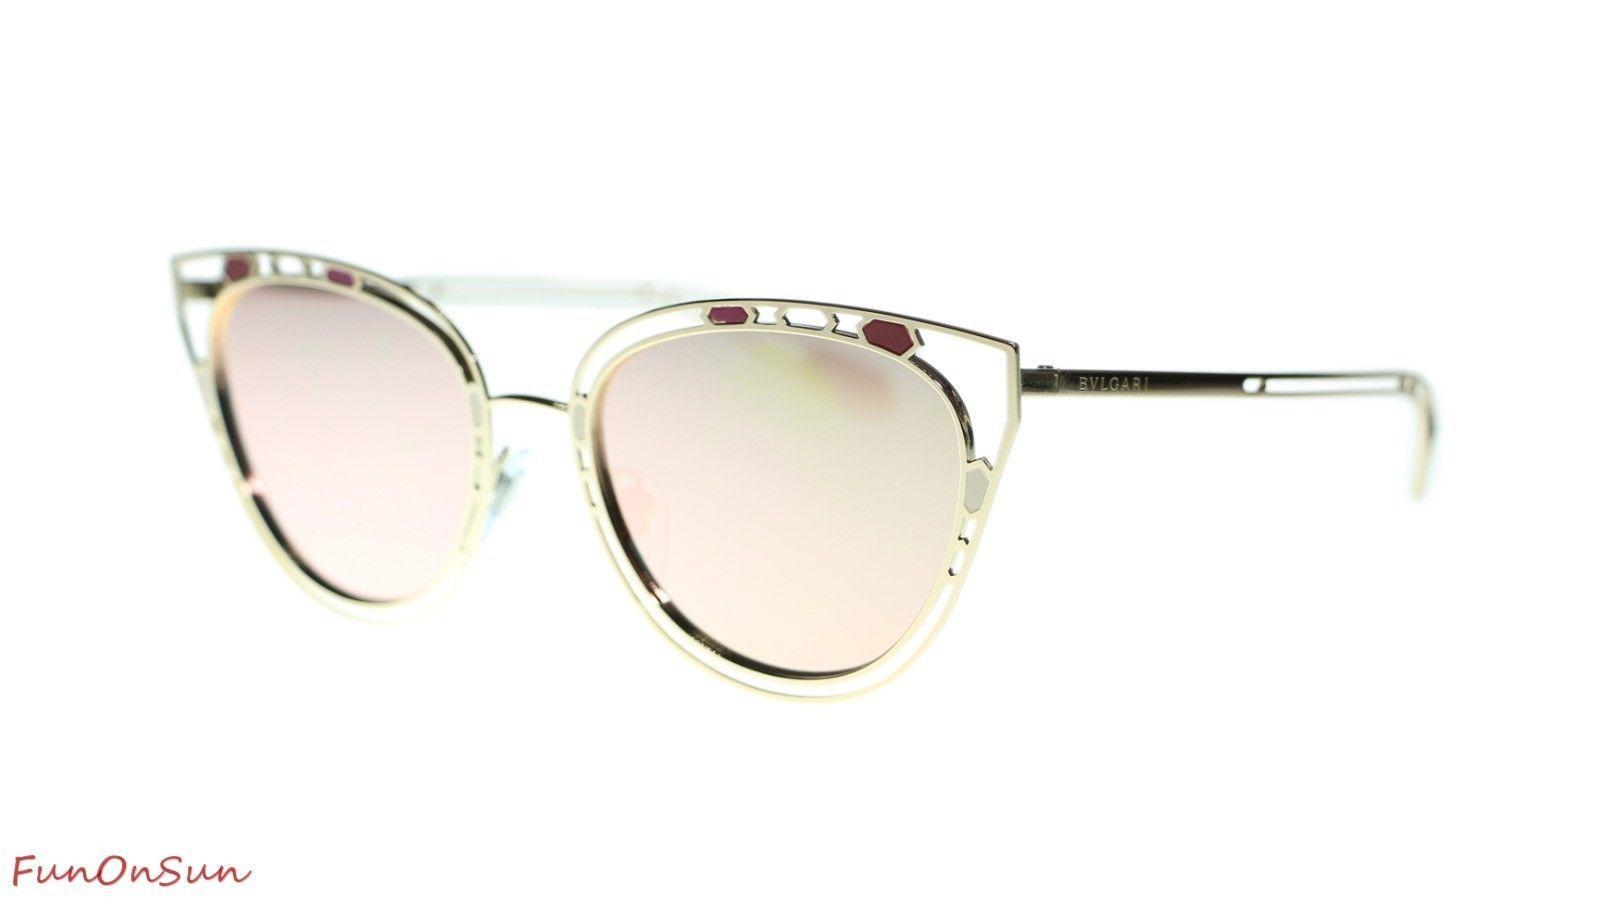 6b0d3a8300c BVLGARI Cat Eye Sunglasses BV6104 20144Z and 21 similar items. 10